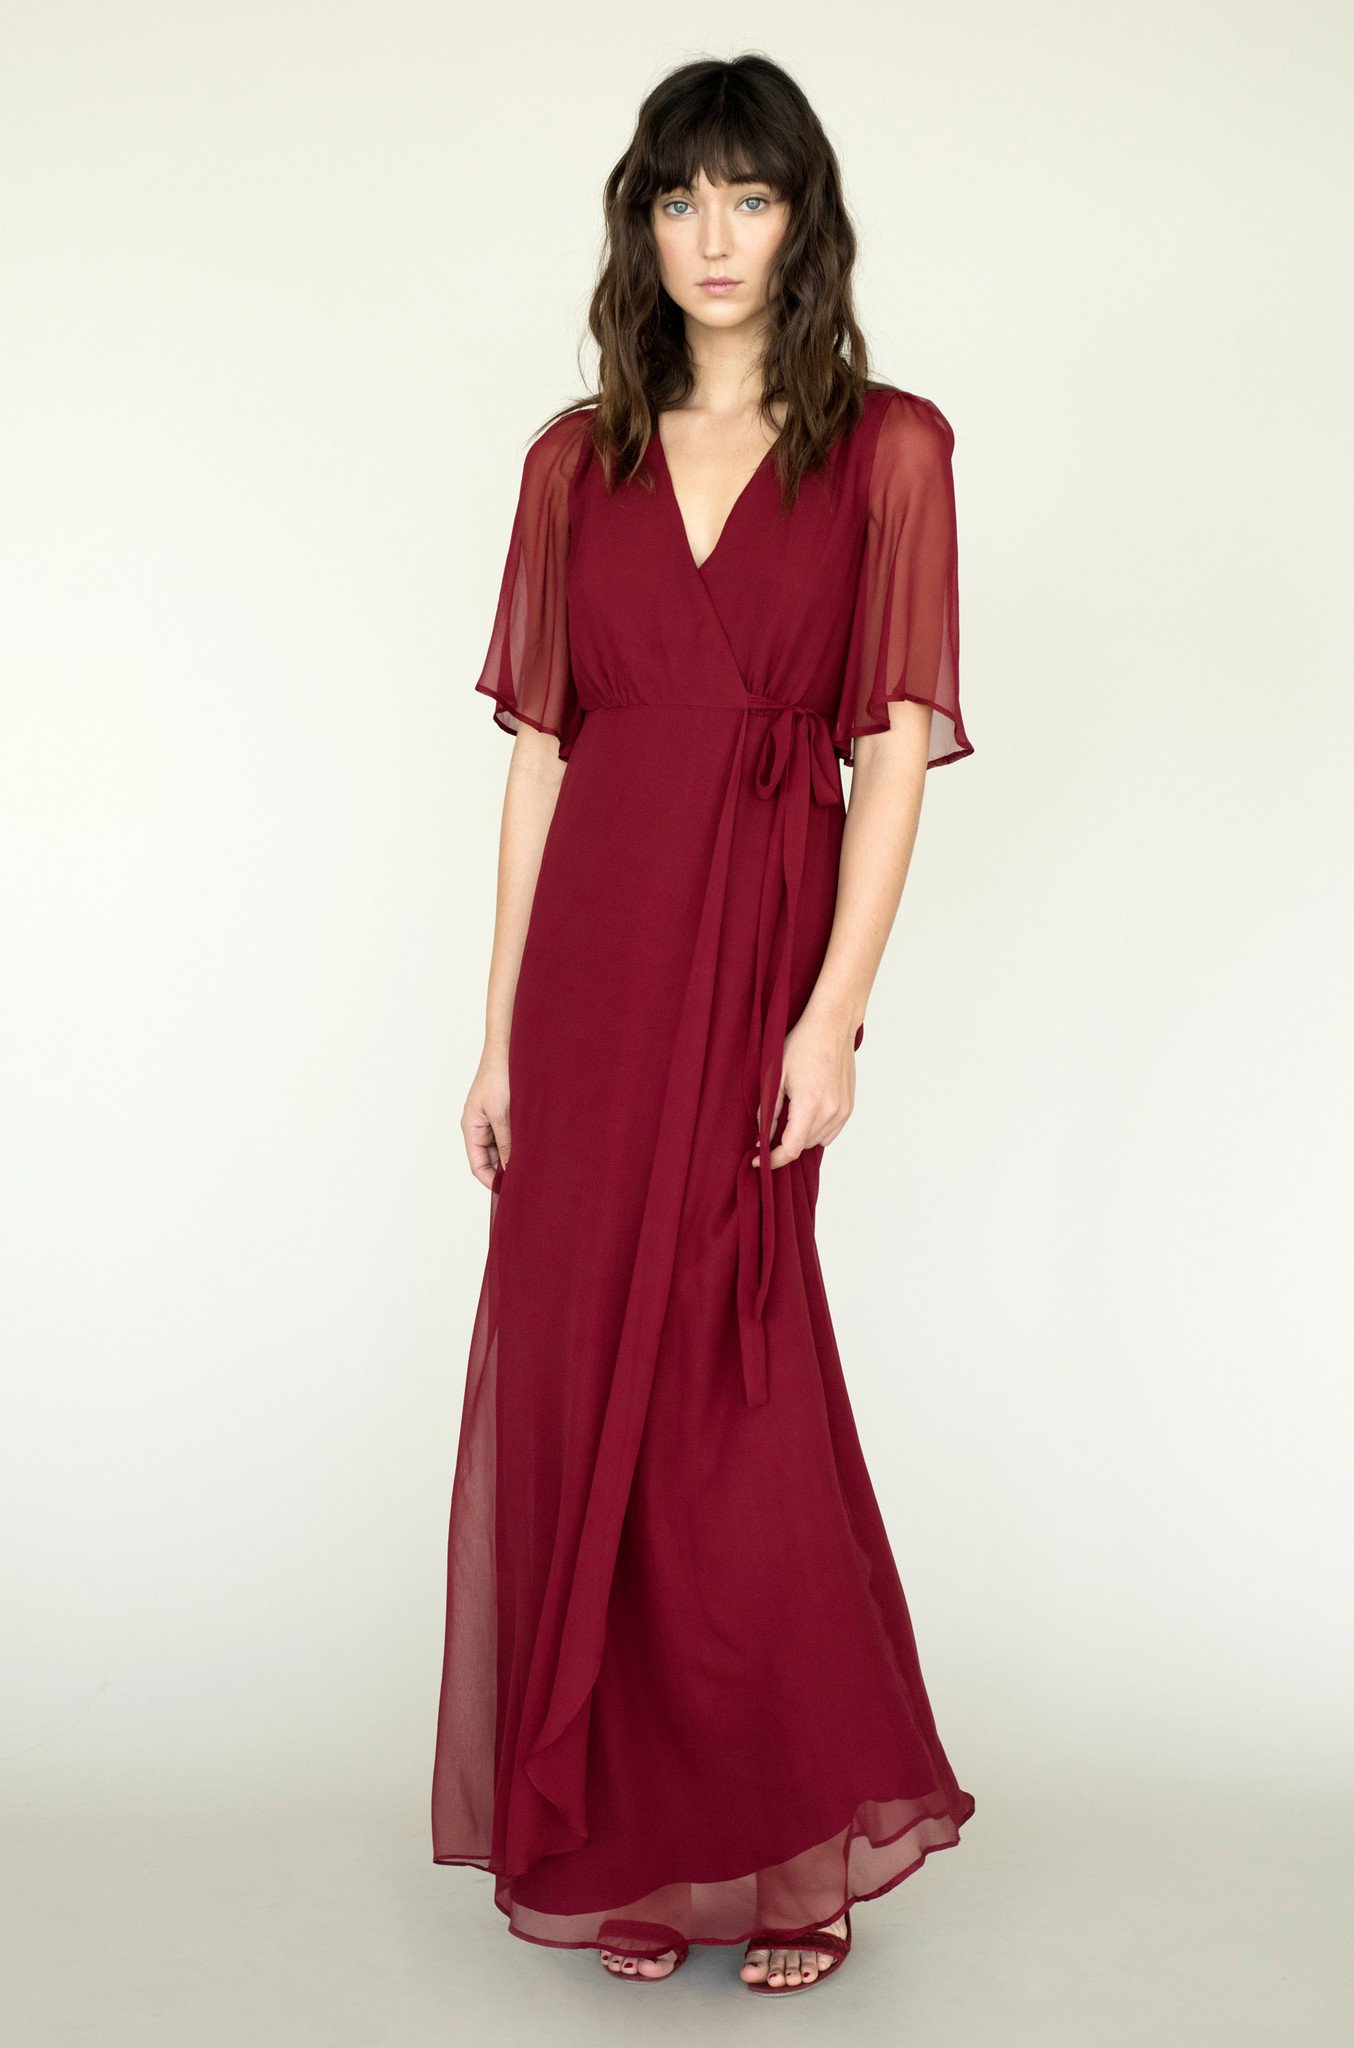 Lily Ashwell 'Aurora' dress in Crimson Silk,  $450